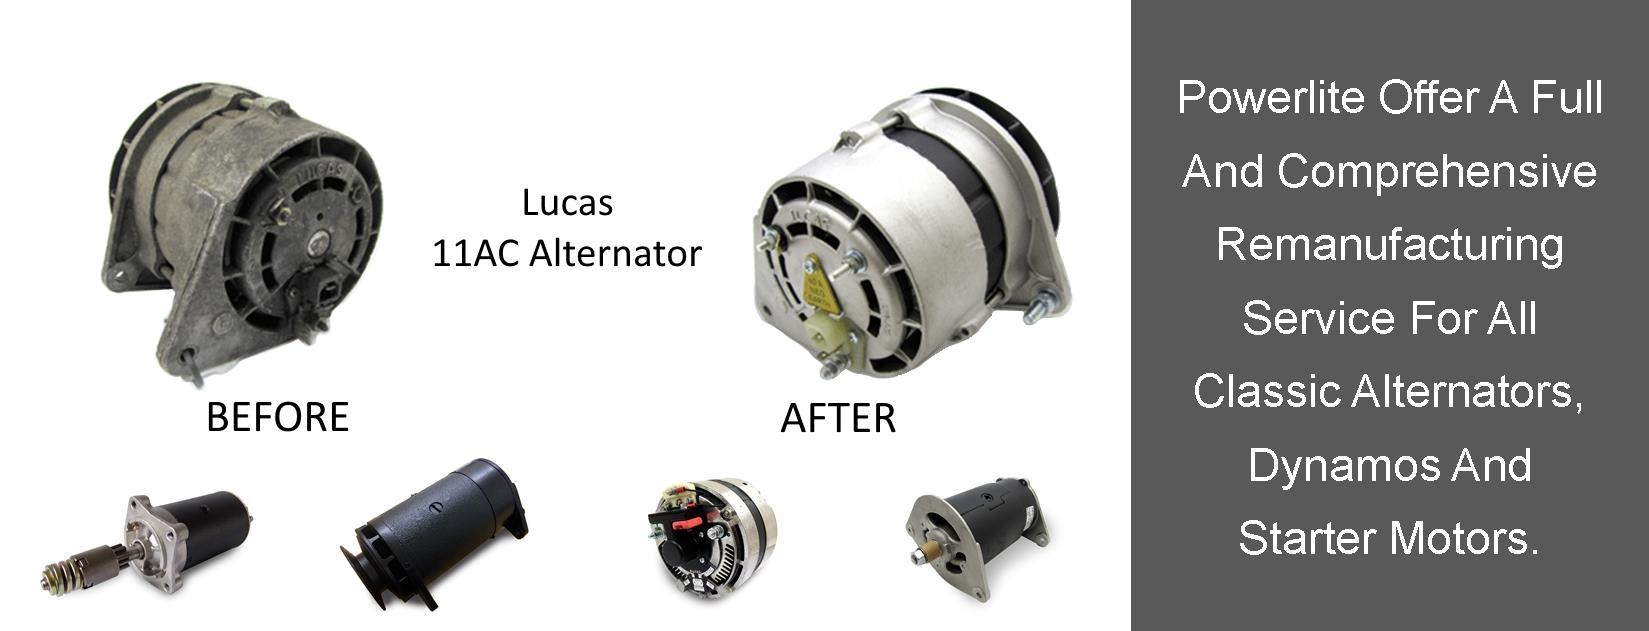 Powerlite - Suppliers of Starter Motors and Alternators